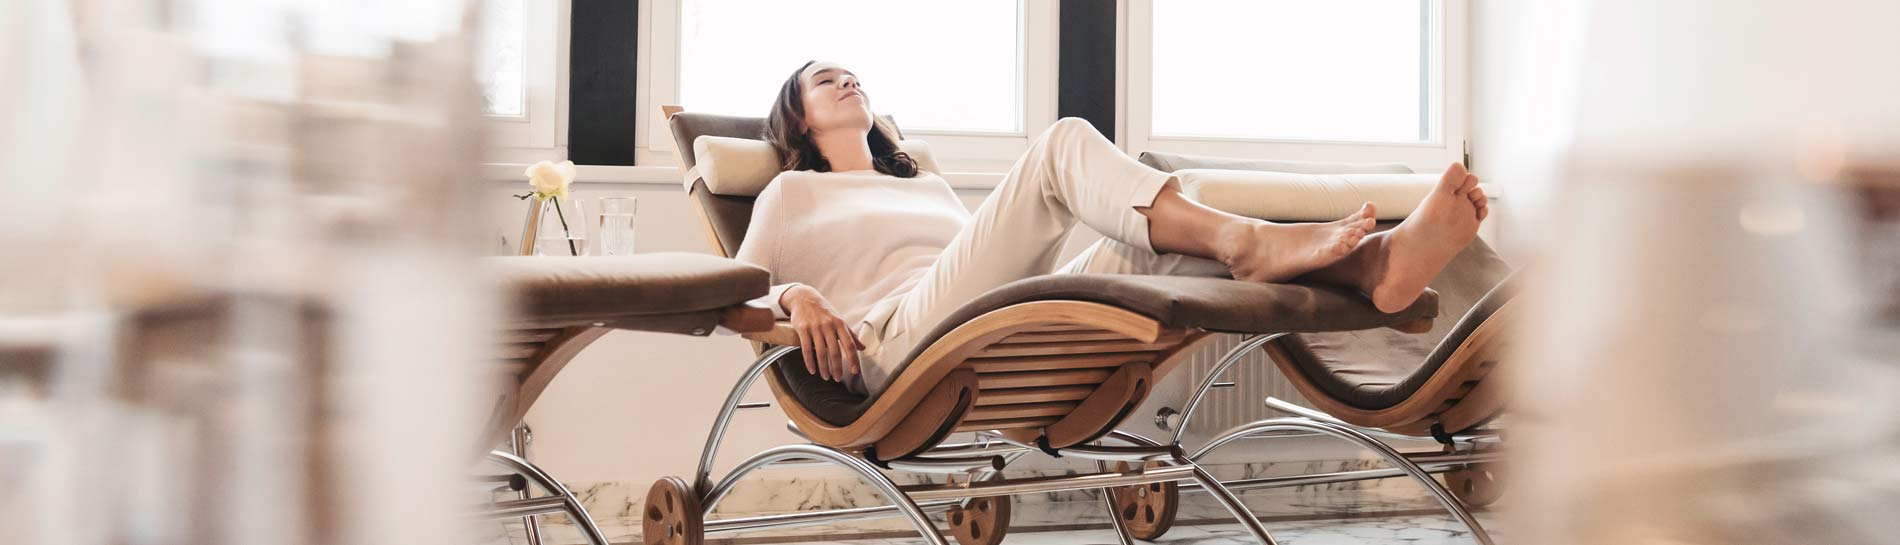 Winter Cleanse – Modern Mayr Medicine at Park Igls Mayr clinic Innsbruck Tyrol Austria – Relax Lounge